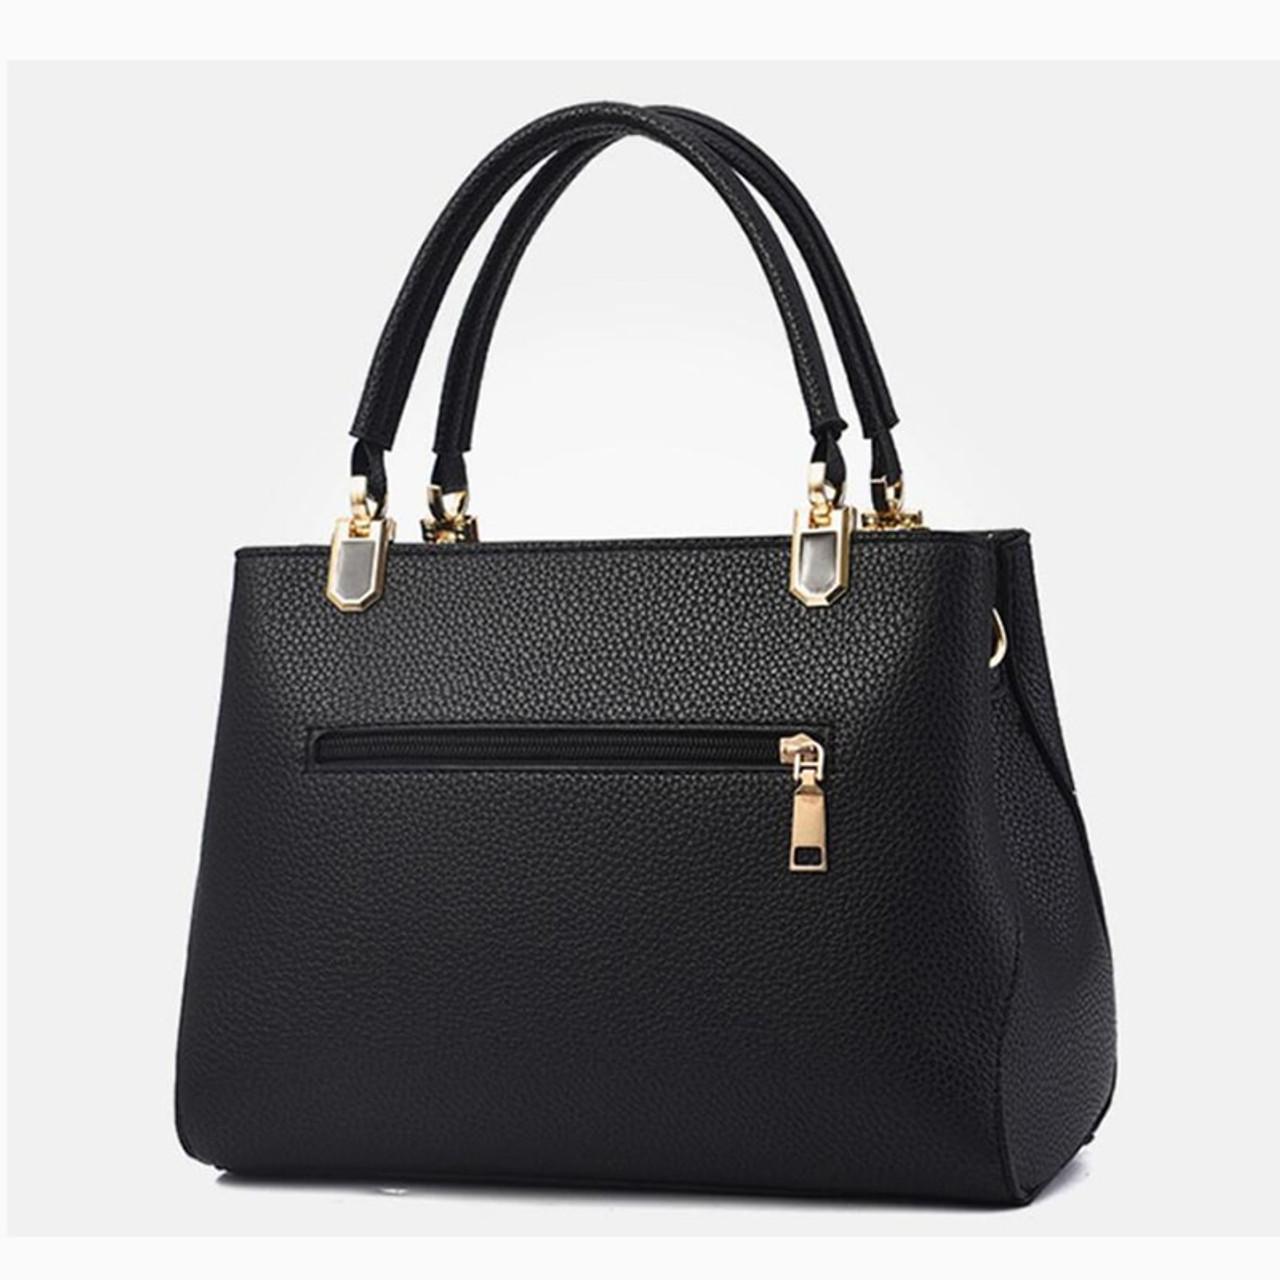 e79b0146b9c ... Women Bag Vintage Messenger Bags Shoulder Handbag Women Top-Handle  Leather Imitation Pattern Composite Bag ...